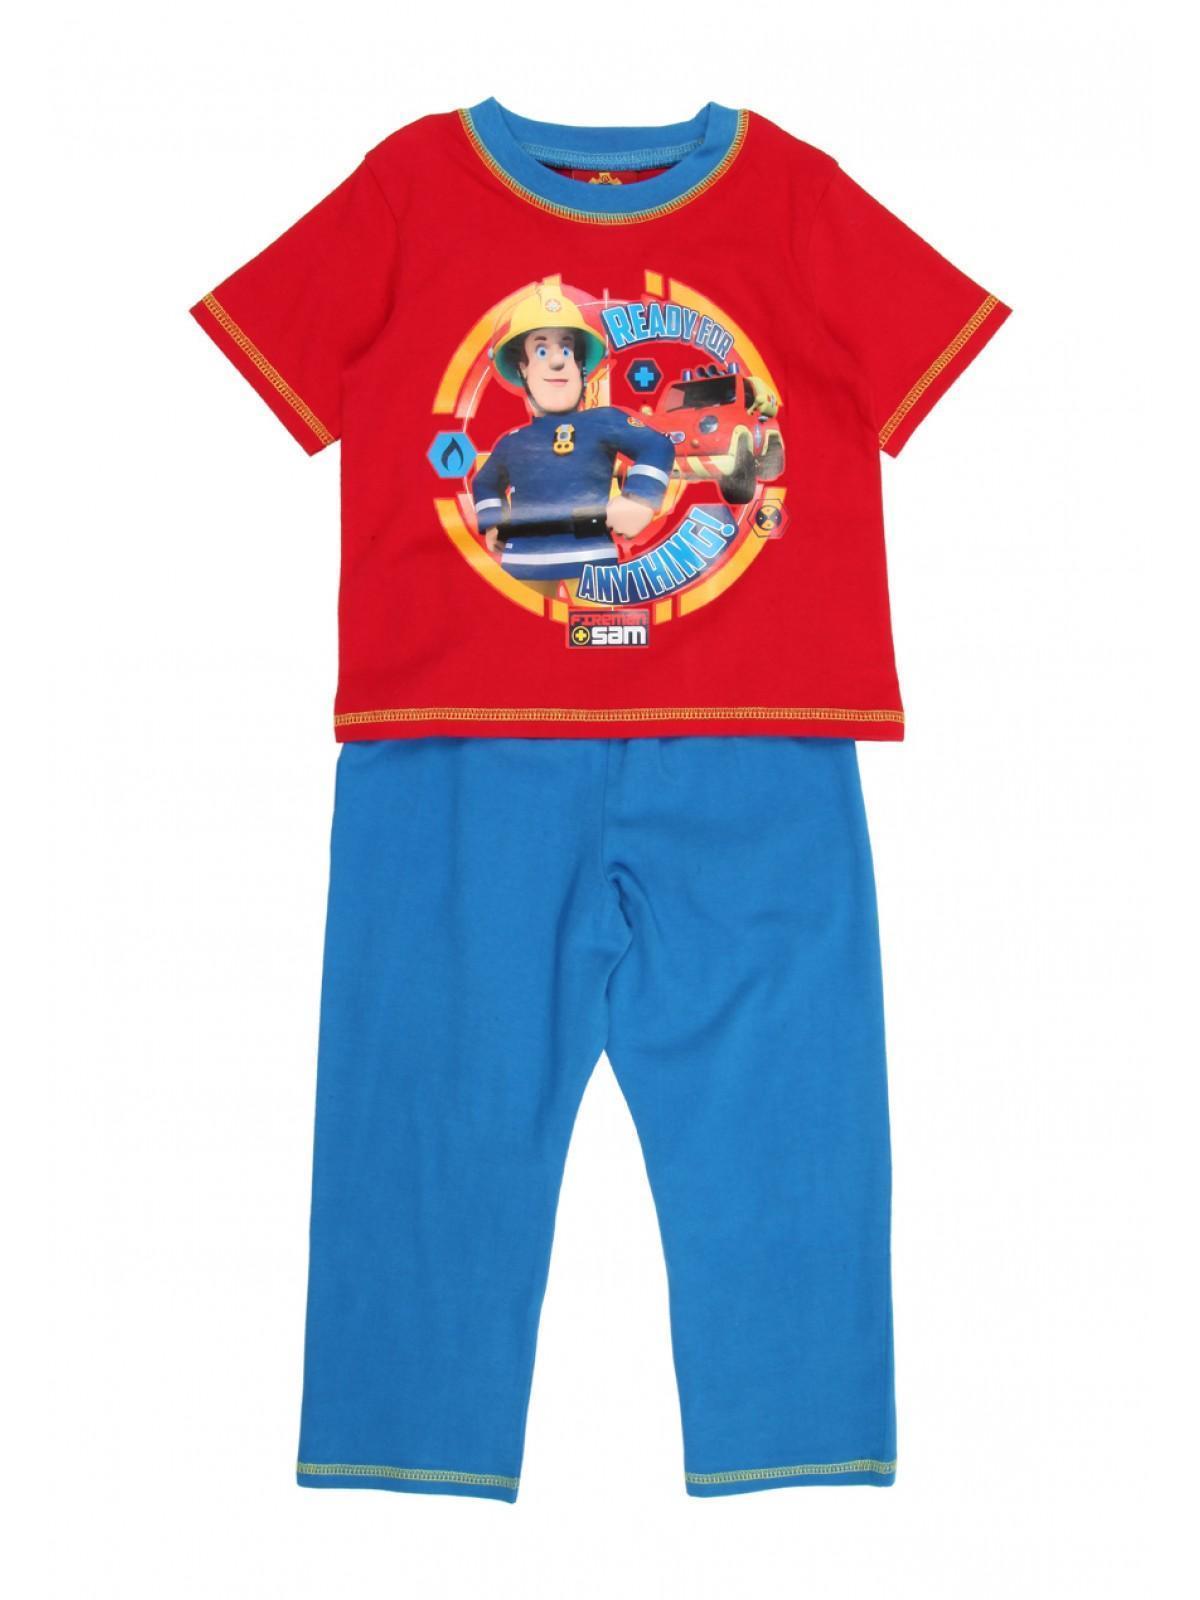 81078a12673 Mens Younger Boys Fireman Sam Pyjamas